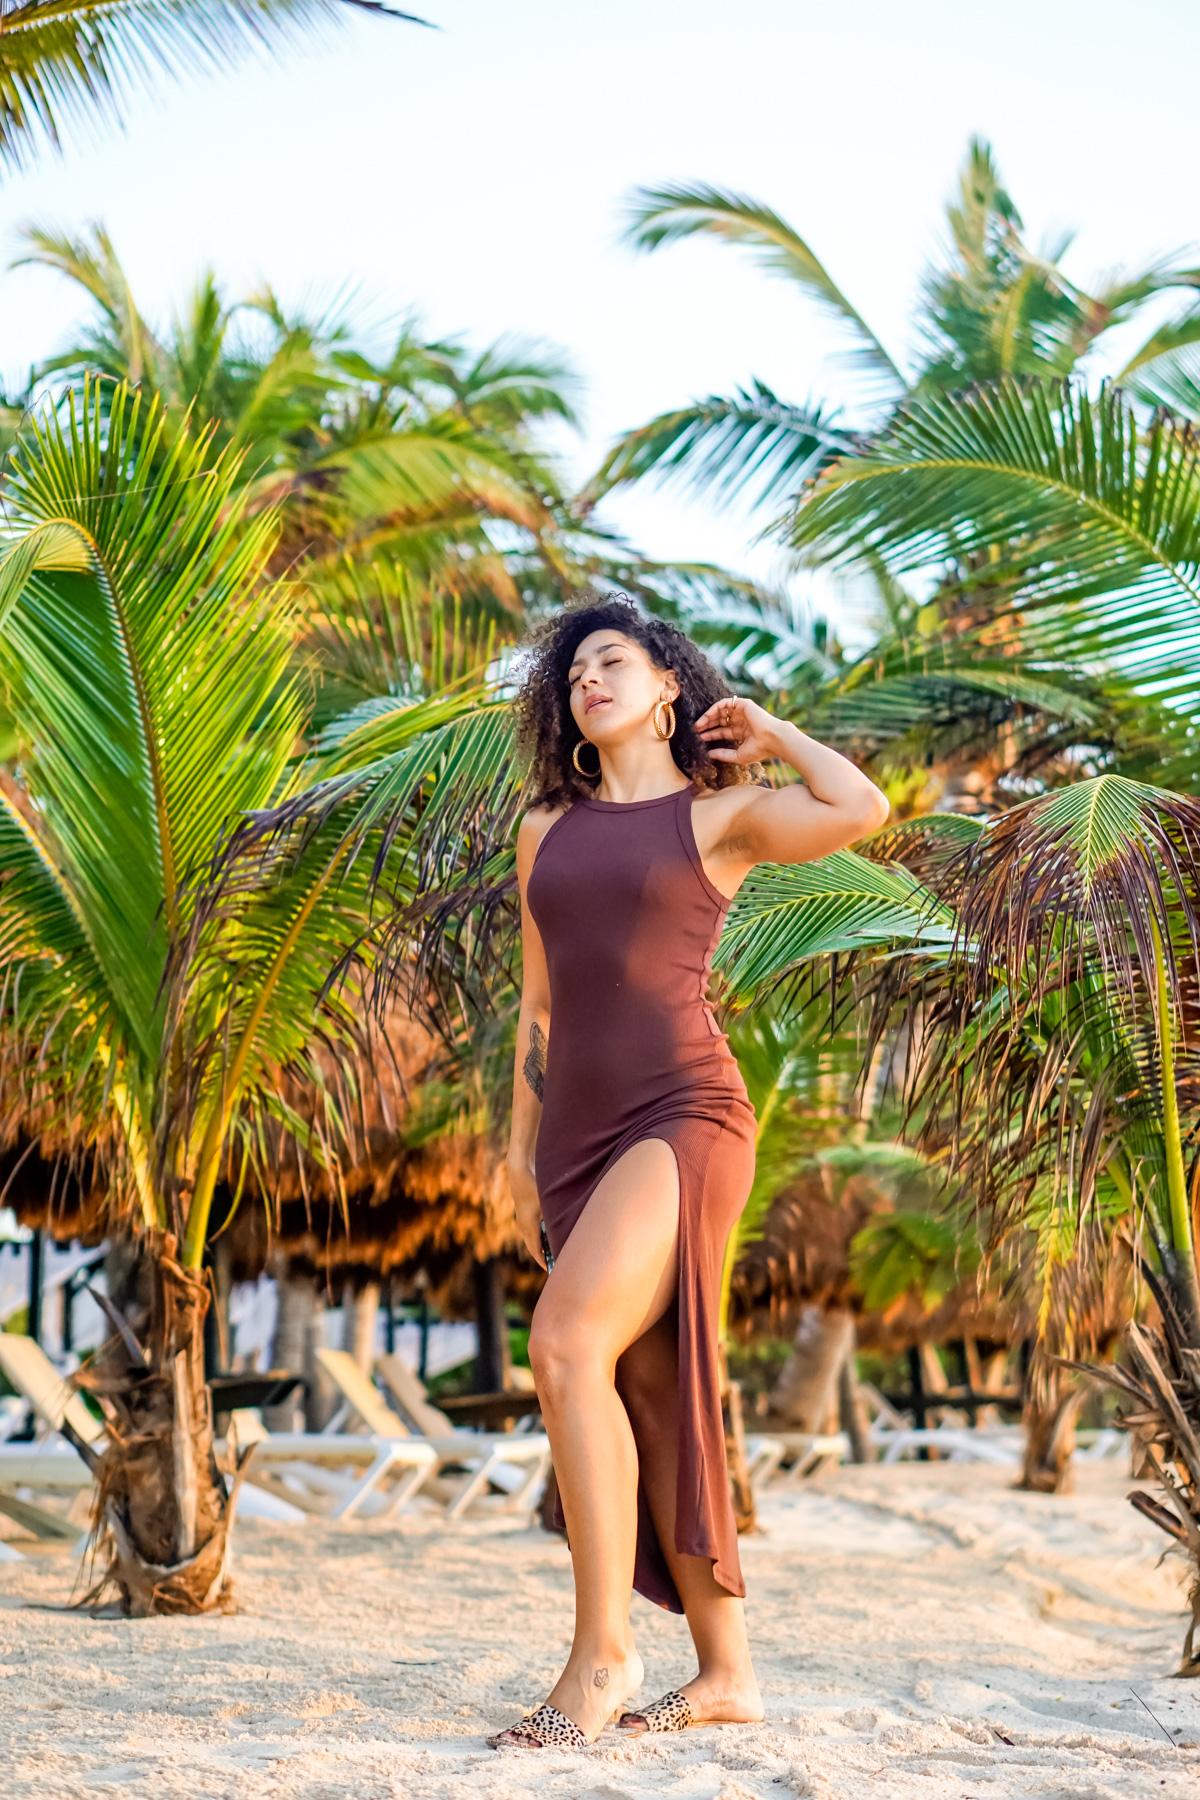 mexico travel, resort vacation outfits black girl, El Dorado Royal Resort by Karisma, black fashion bloggers, all inclusive resorts in Mexico, vacation style black girl